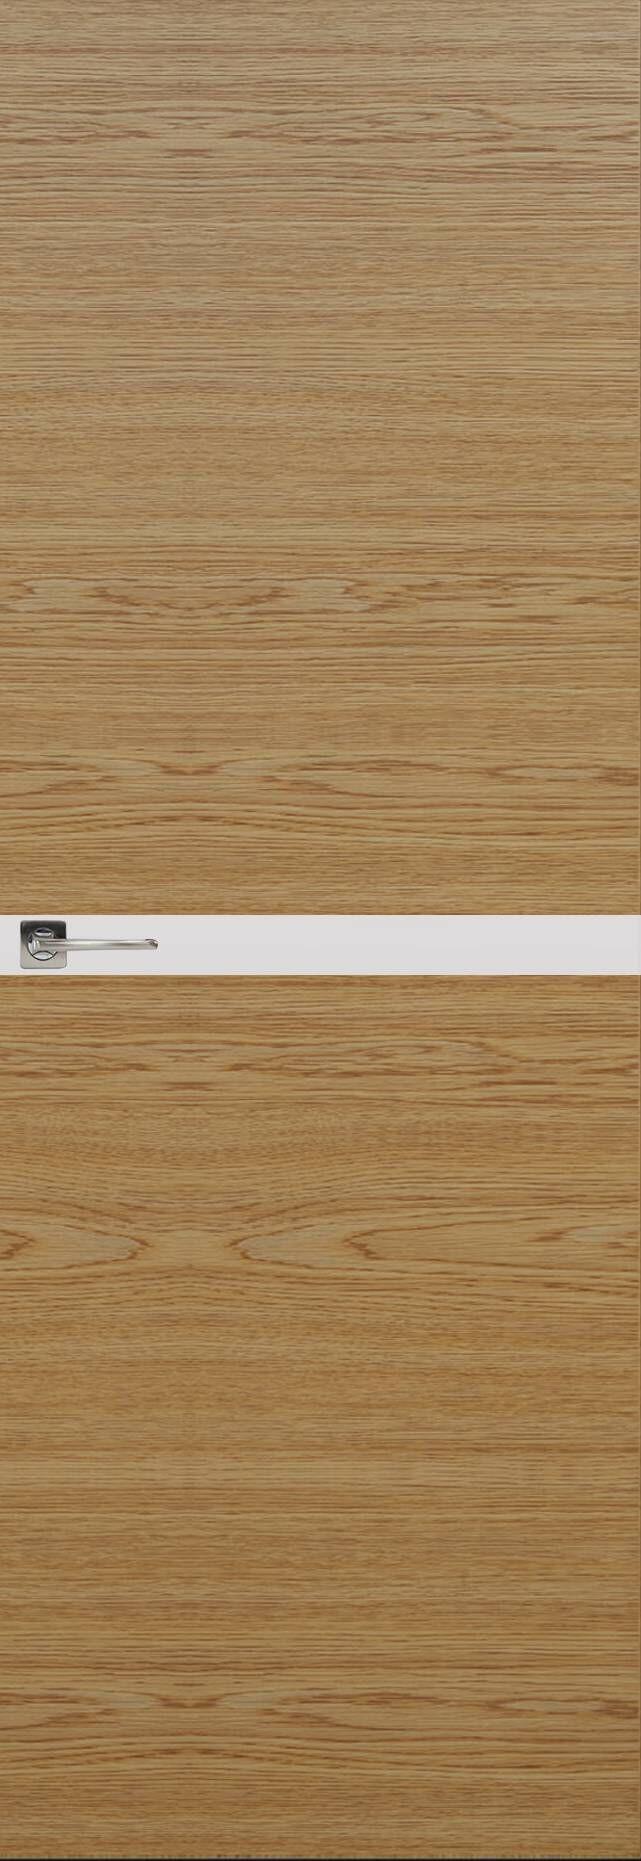 Tivoli Б-4 Невидимка цвет - Дуб карамель Без стекла (ДГ)